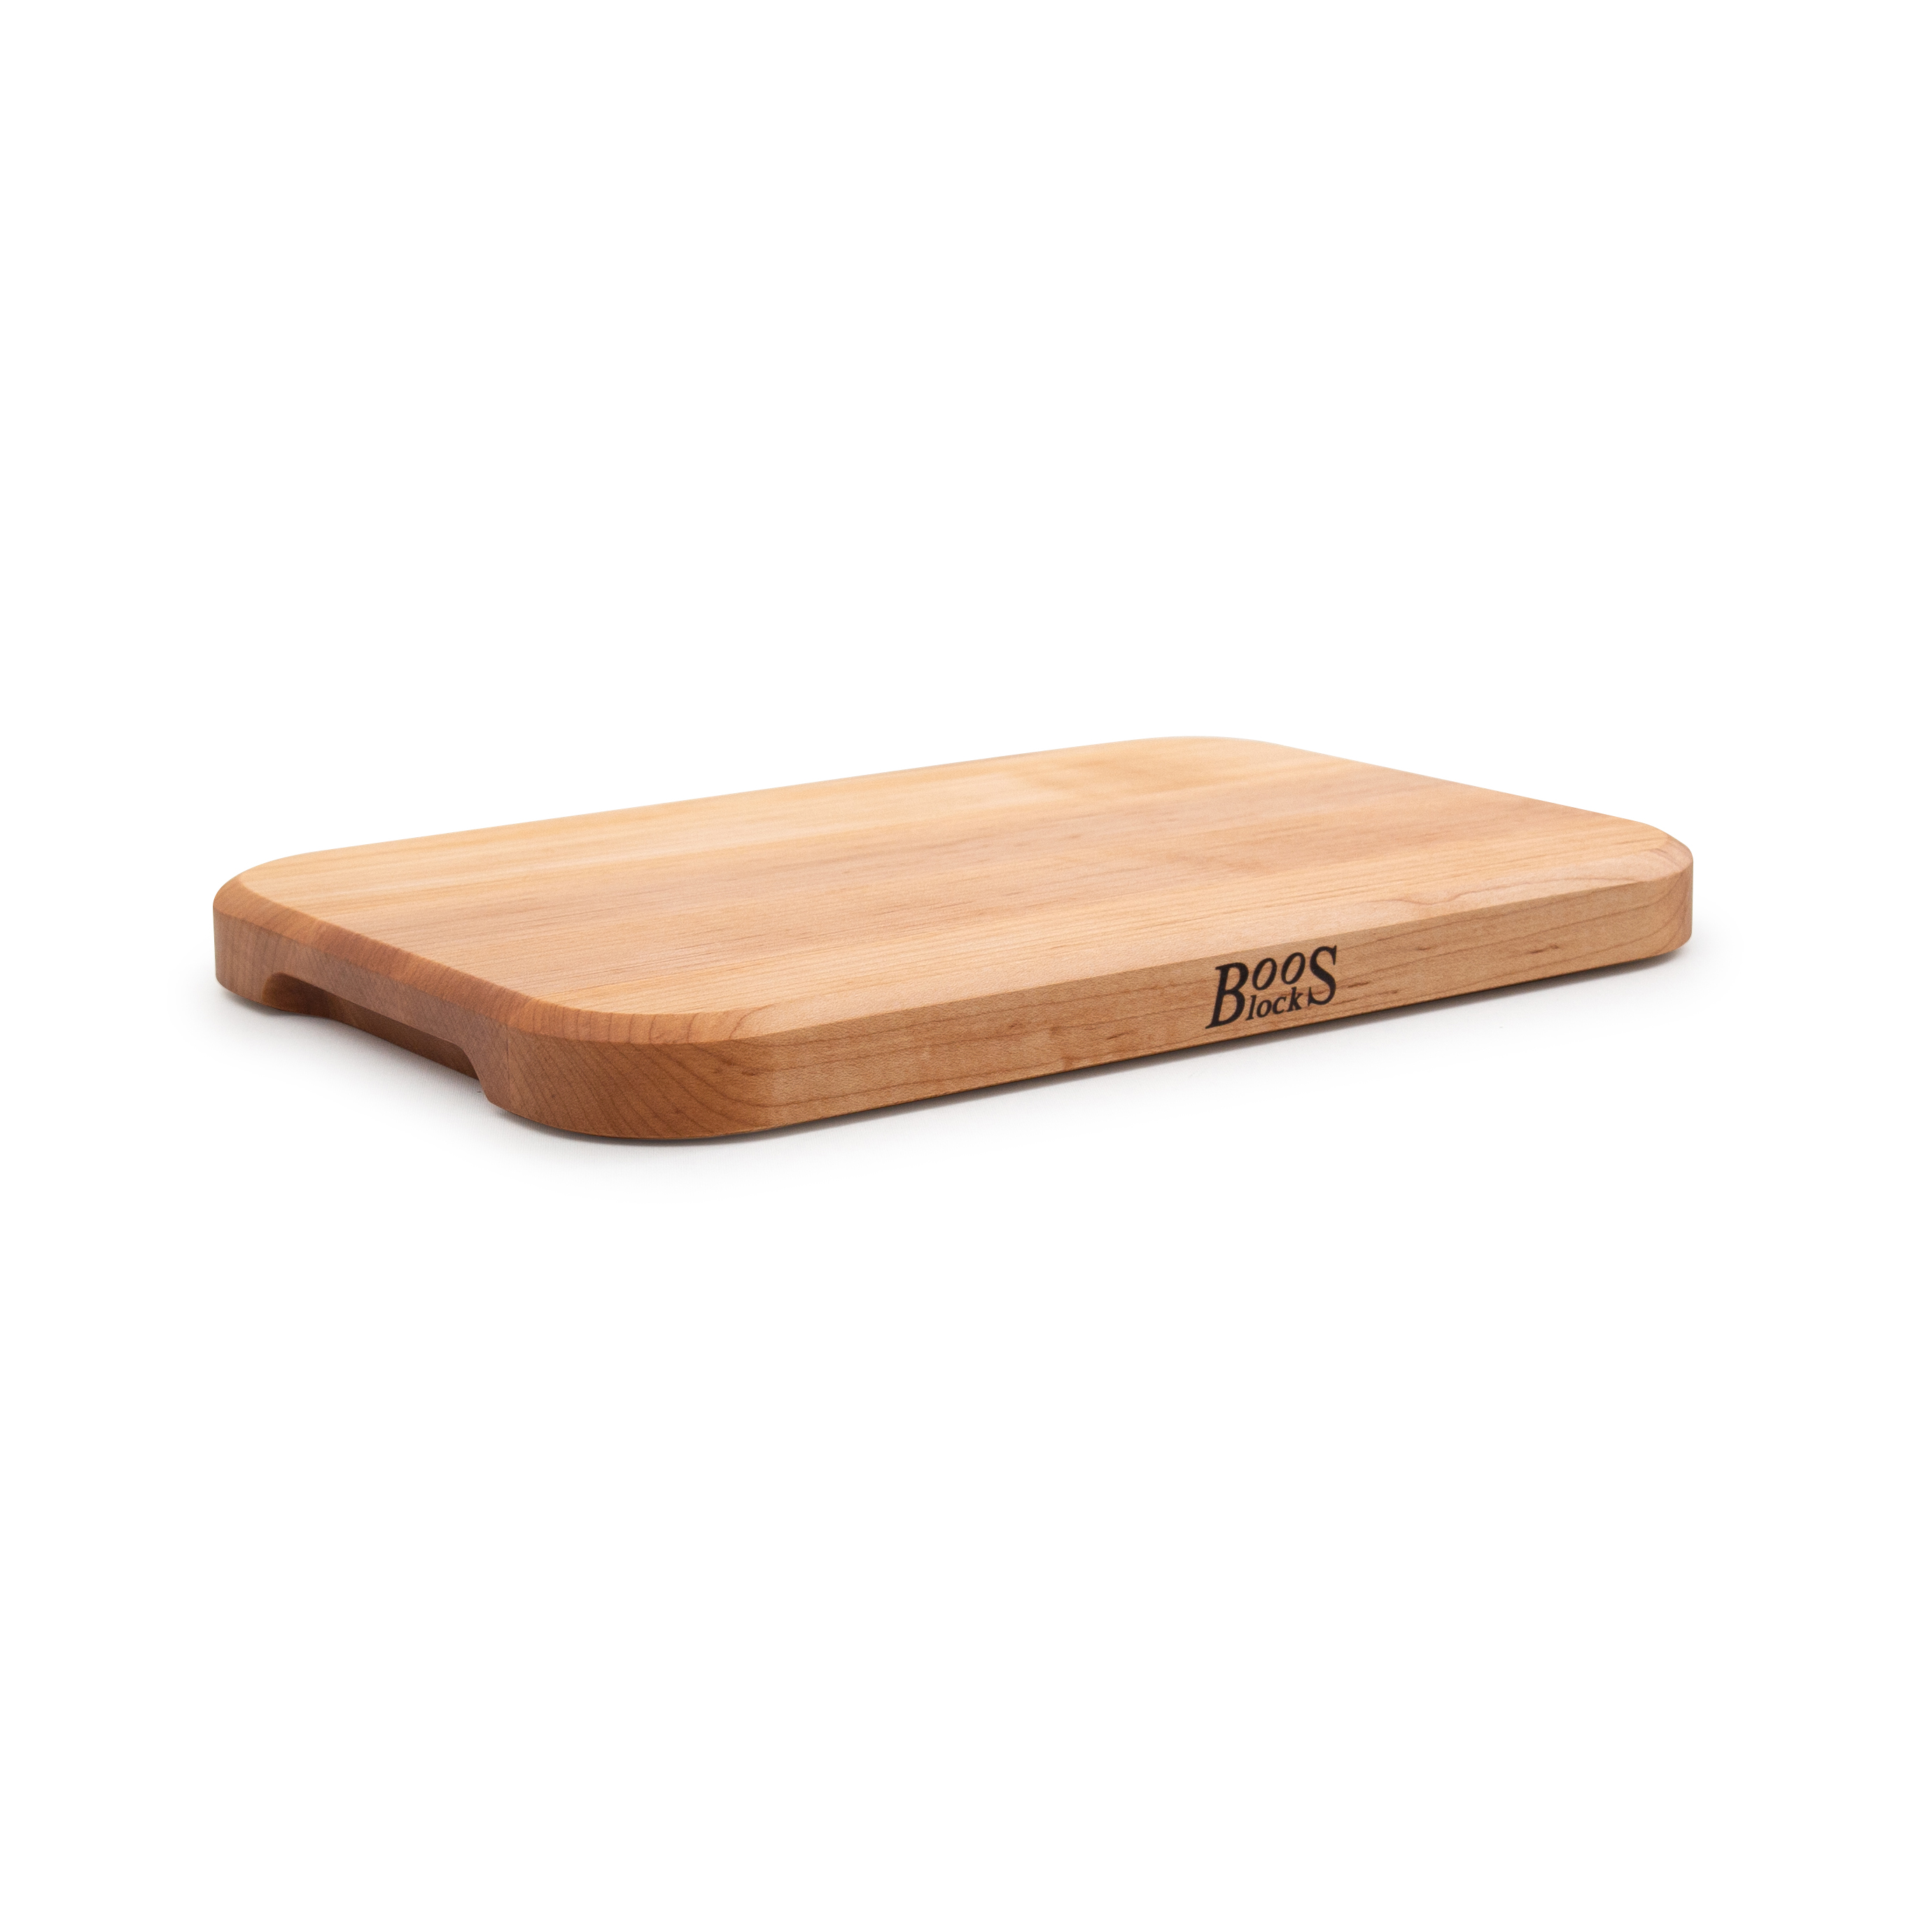 John Boos CB4C-M120801 cutting board, wood